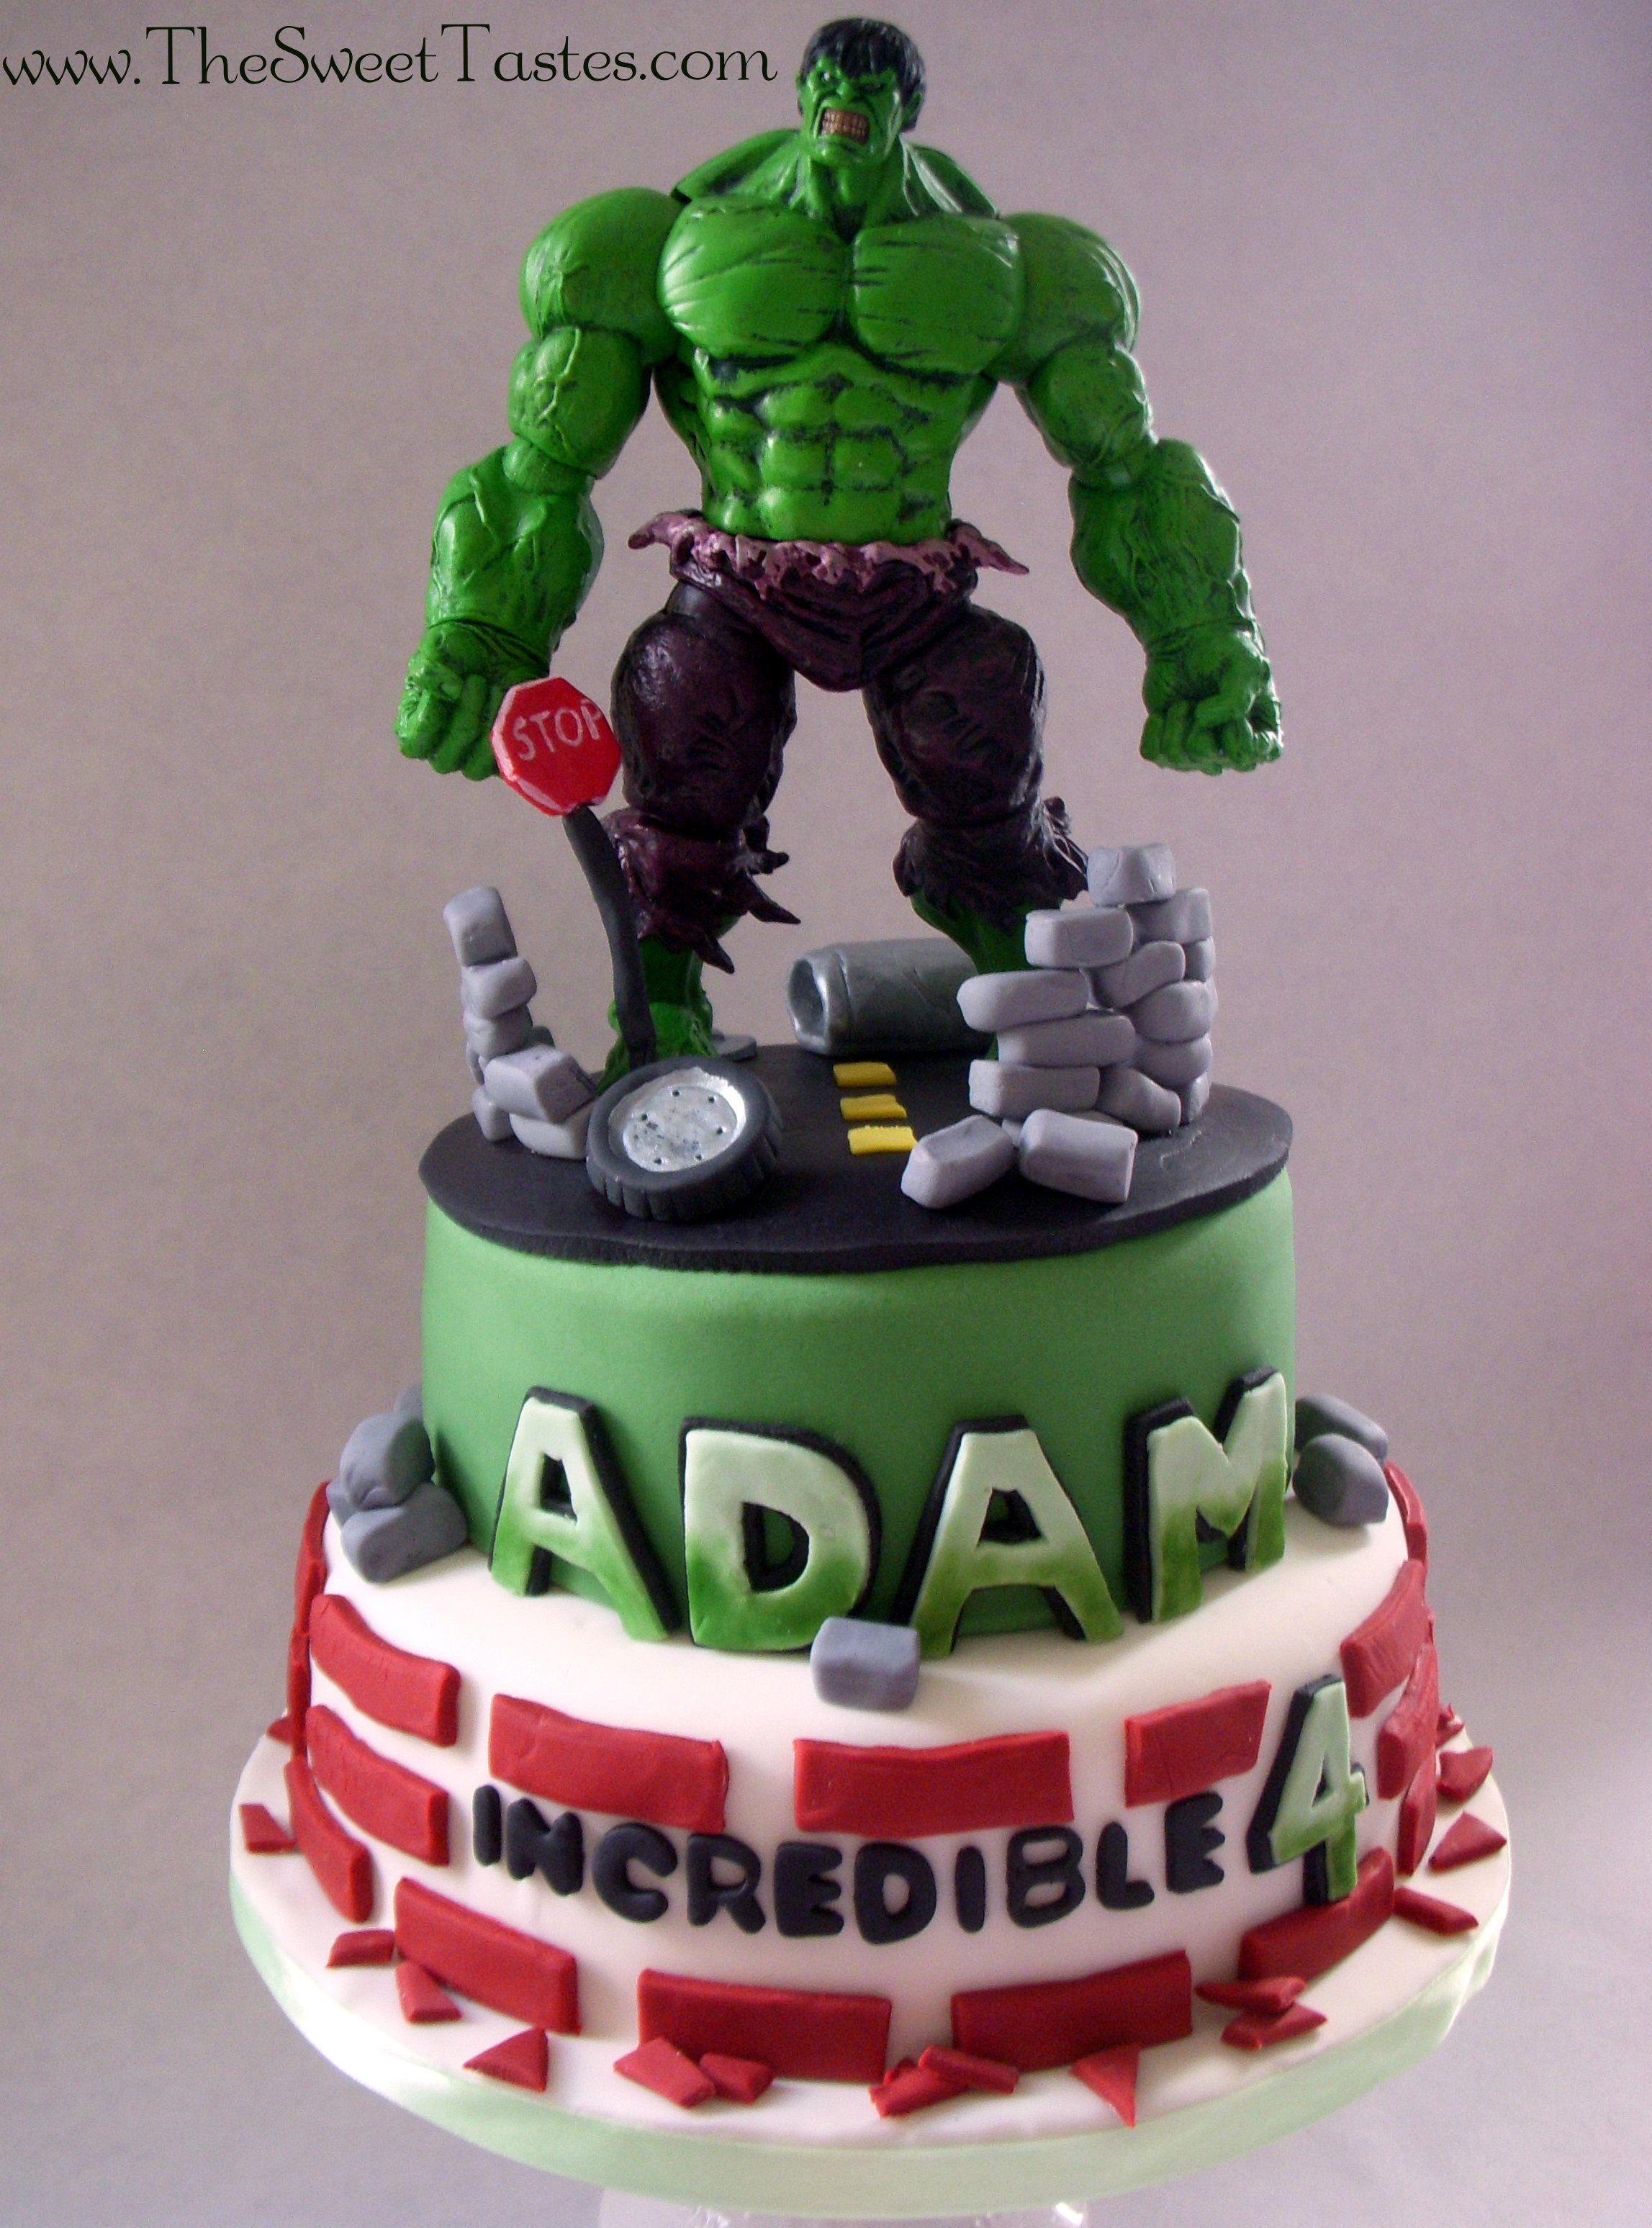 Incredible Hulk birthday cake wwwTheSweetTastescom Cake Ideas